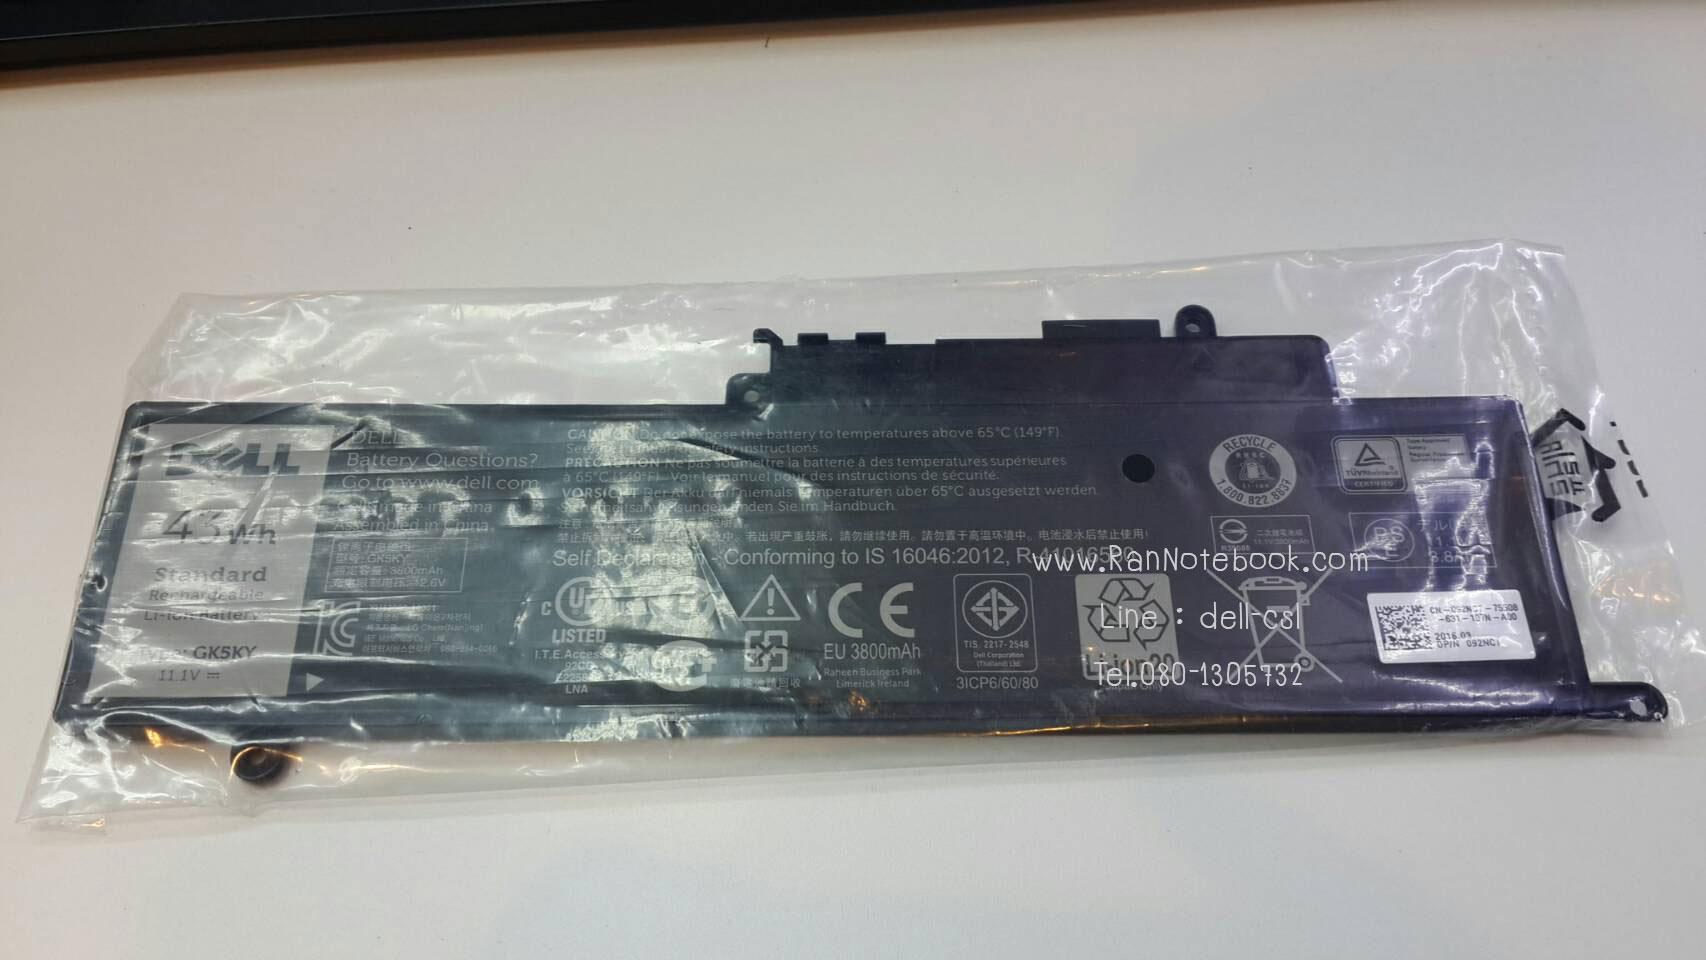 Battery DELL inspiron 3147 3148 3158 inspiron 11 3000 series ของแท้ ประกันศูนย์ ราคา ไม่แพง